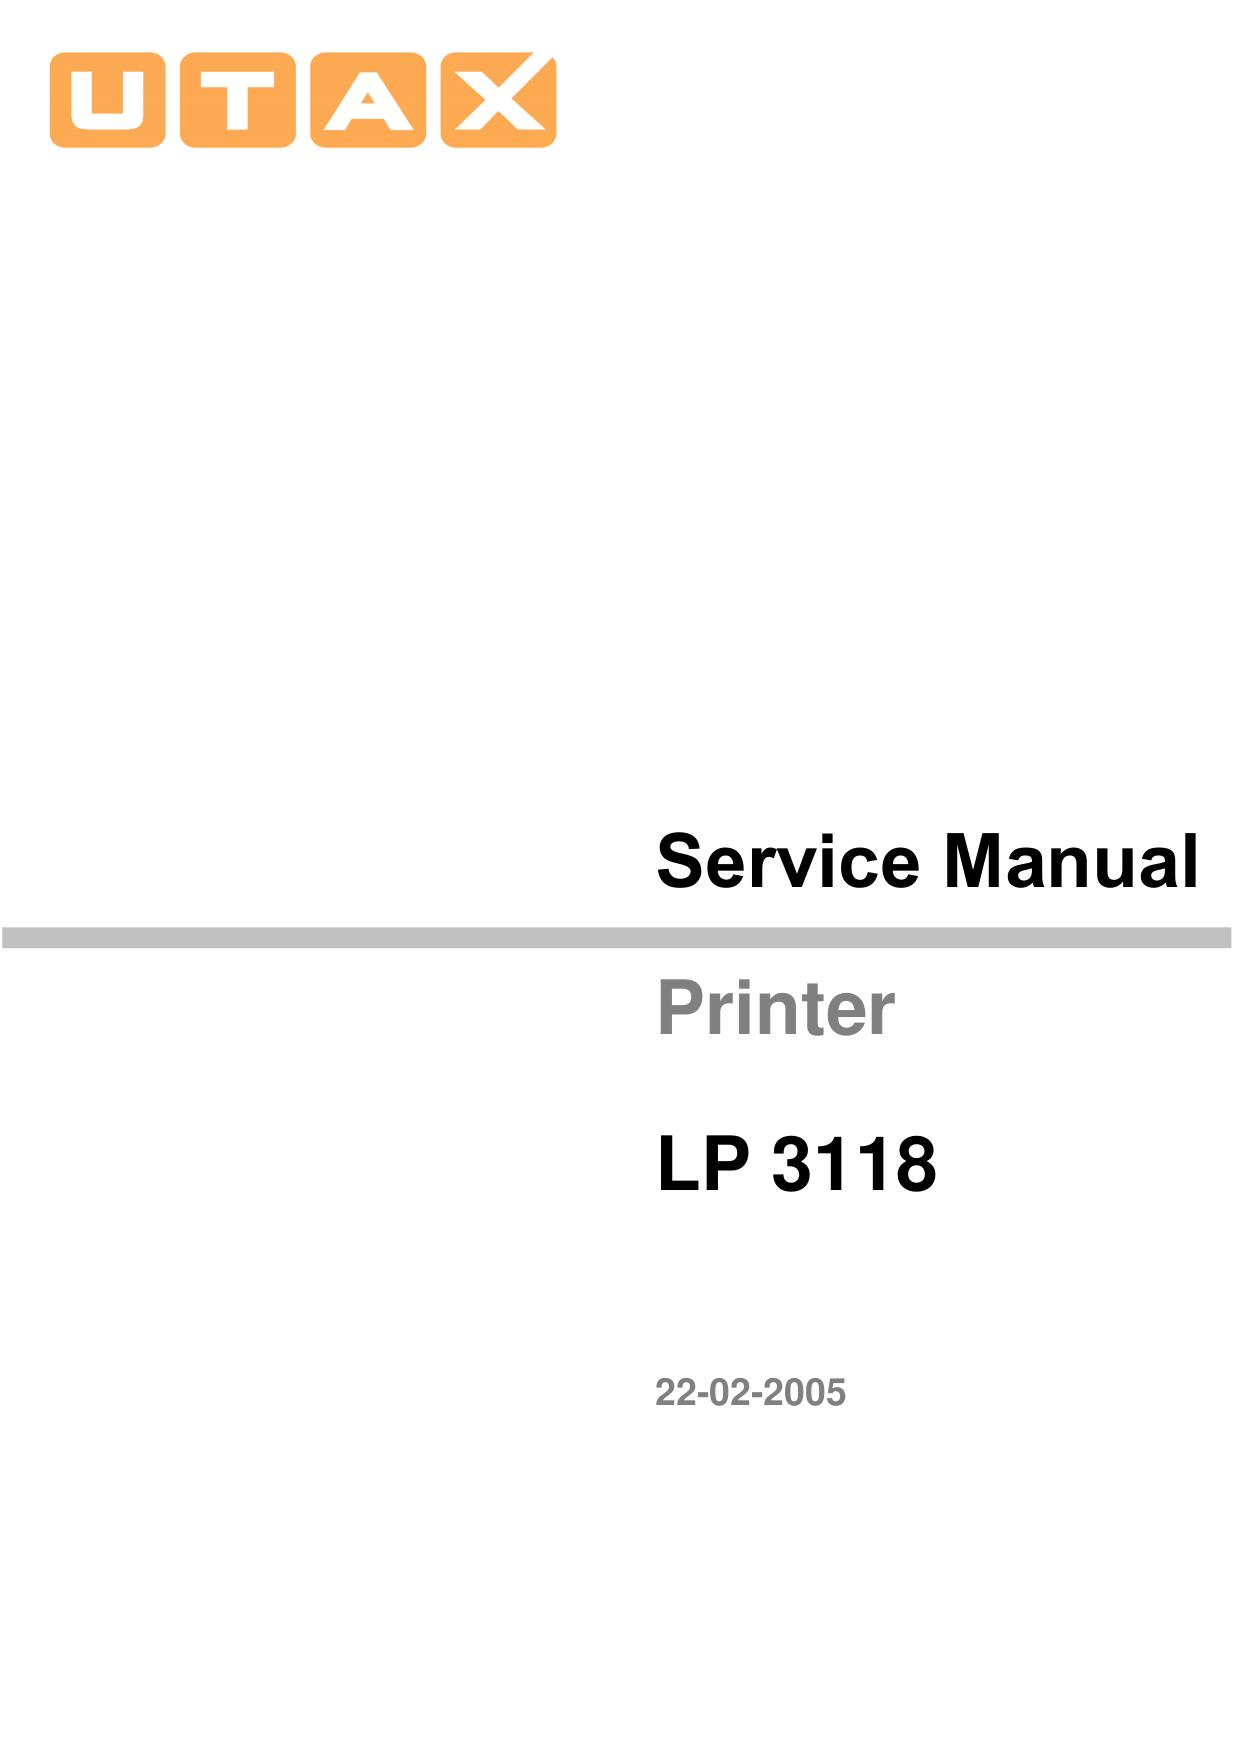 Download free pdf for Kyocera FS-720 Printer manual